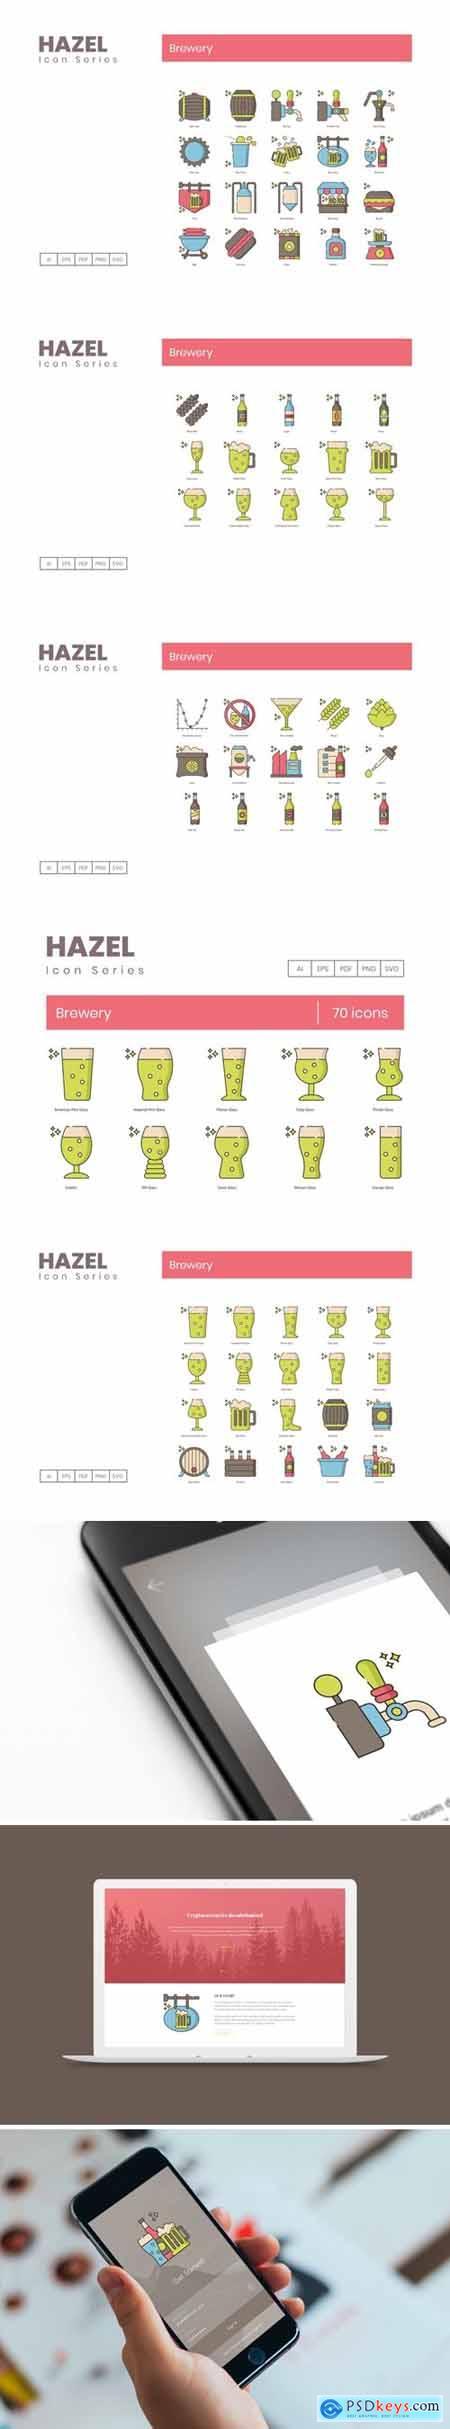 70 Brewery Icons - Hazel Series